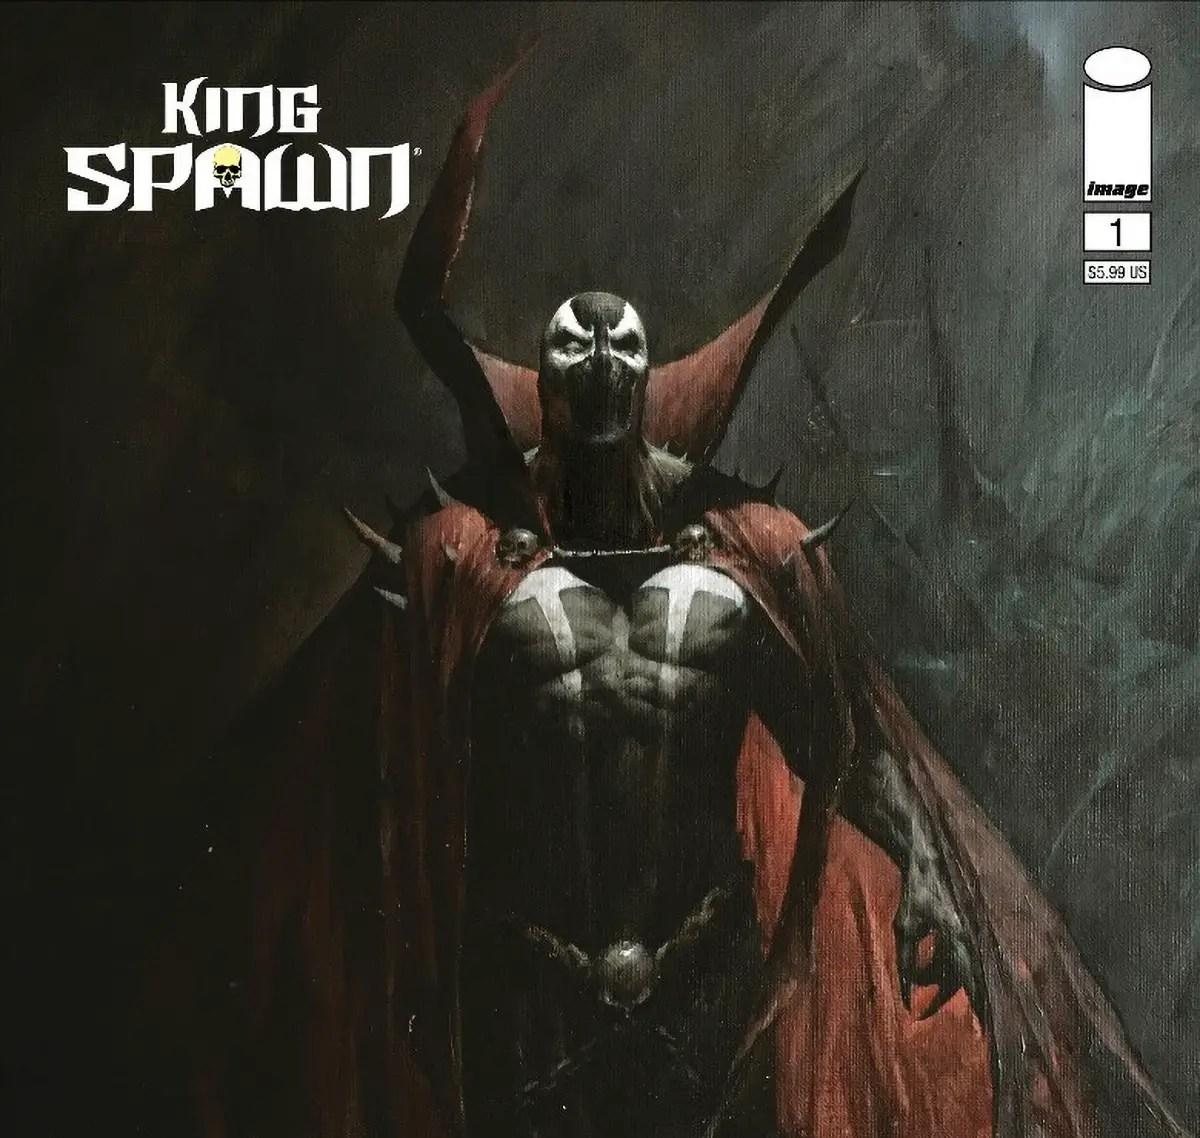 'King Spawn' #1 reveals a grim supernatural world worth exploring